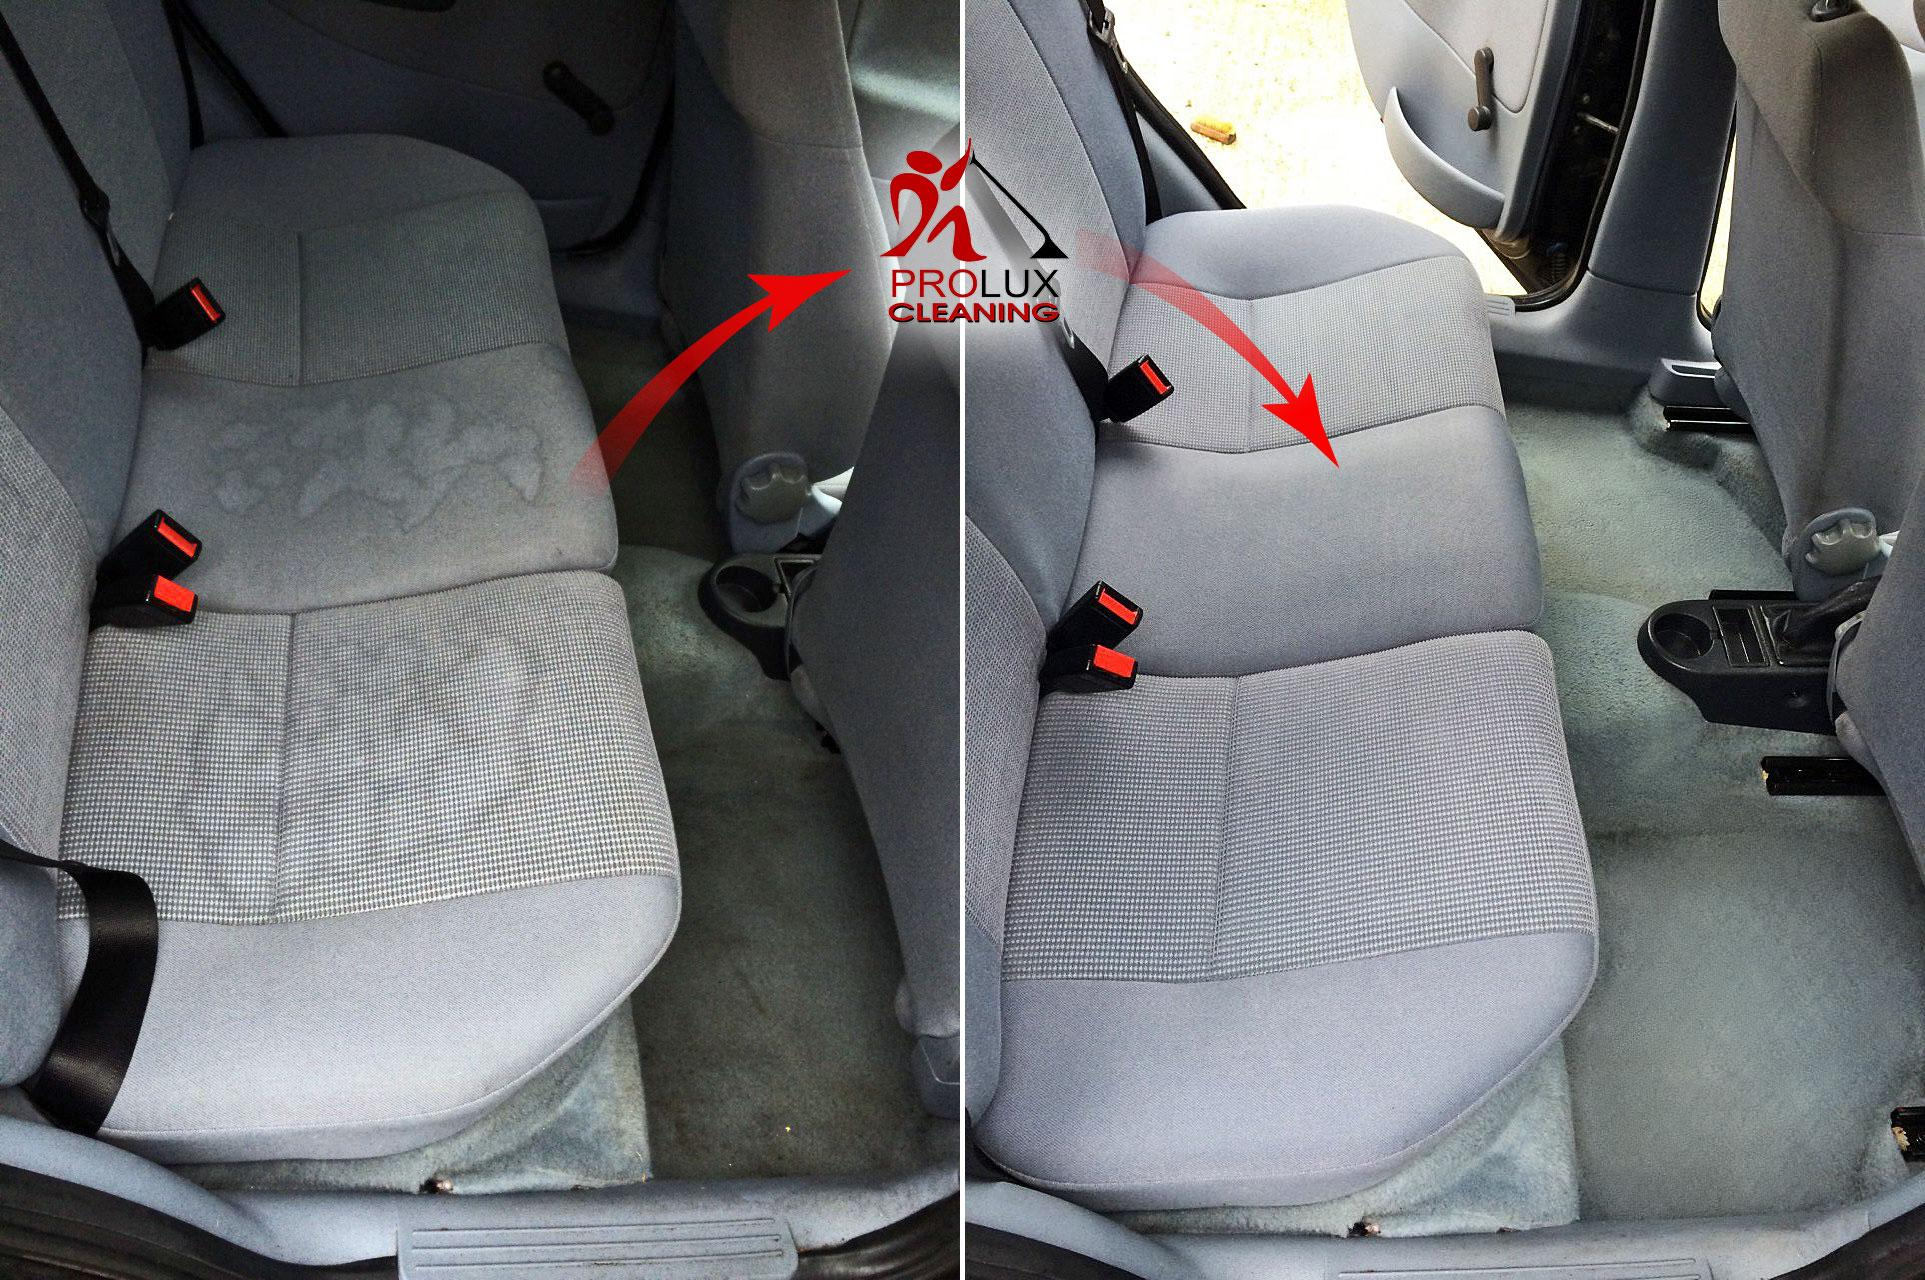 Title; Title; Title; Title; Title; Title; Title; Title. Information. Get  Your Car Interior Detailing ...